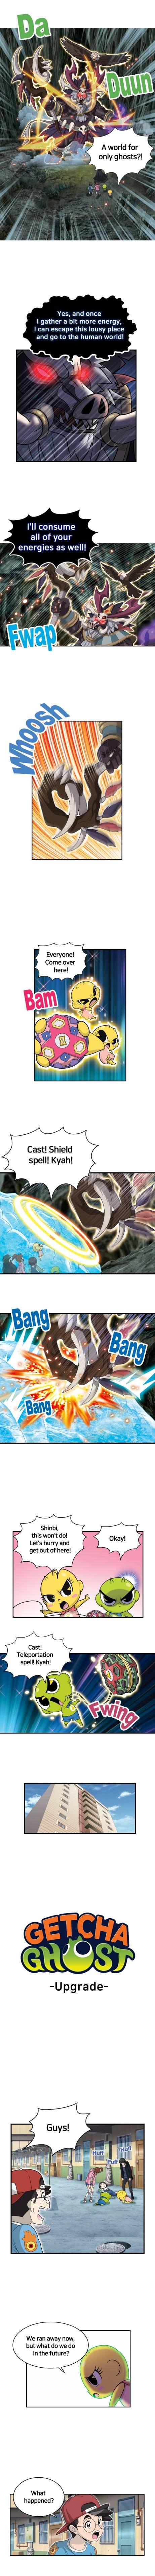 GETCHA GHOST: Featured - Webtoon -5 image 2